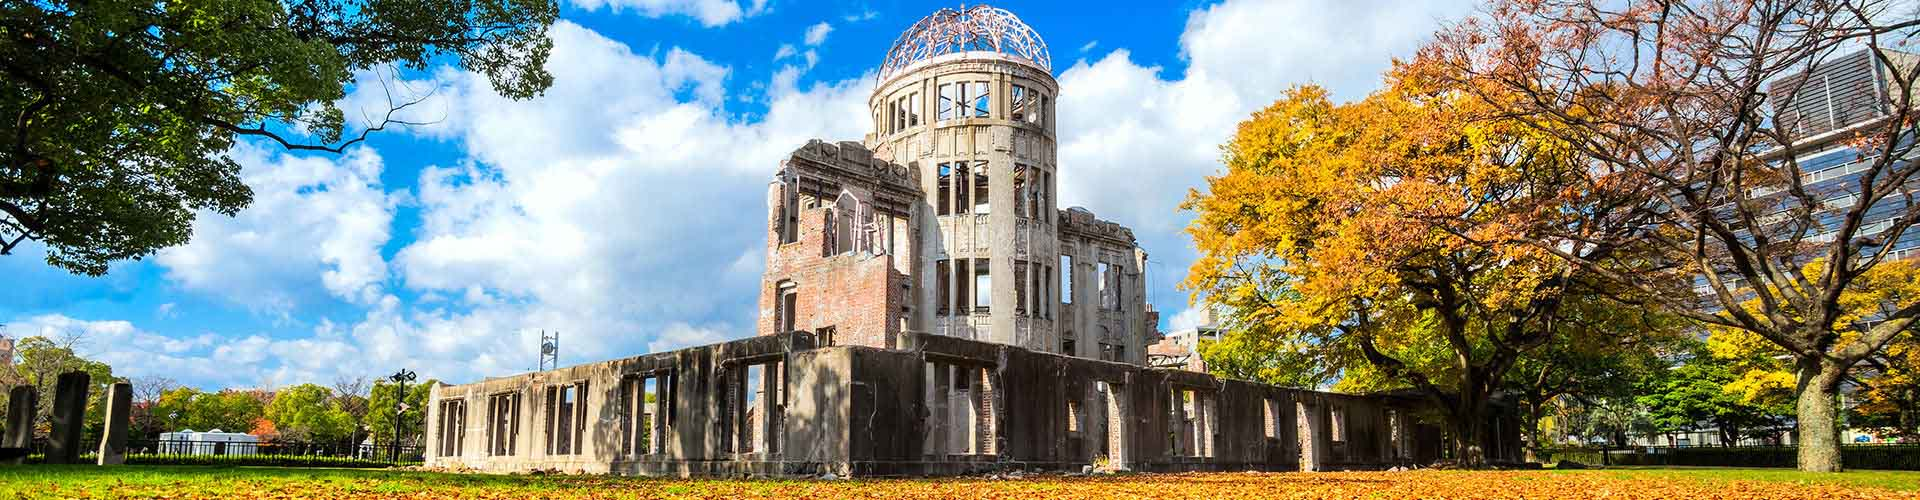 Hiroshima - Campamentos en Hiroshima. Mapas de Hiroshima, Fotos y comentarios de cada Campamento en Hiroshima.